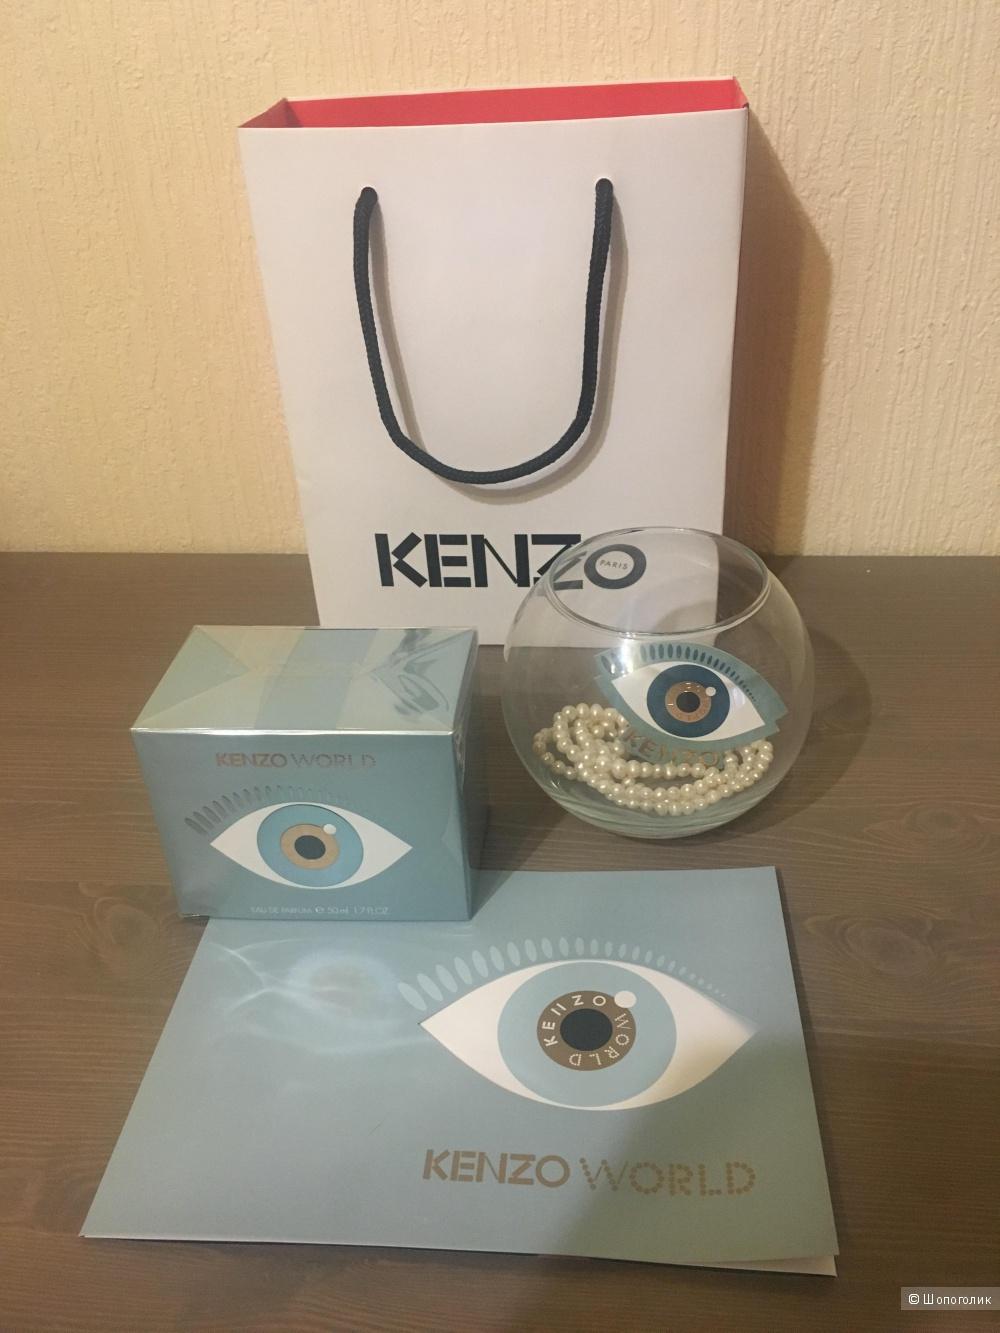 Женская парфюмерная вода Kenzo World, 50мл